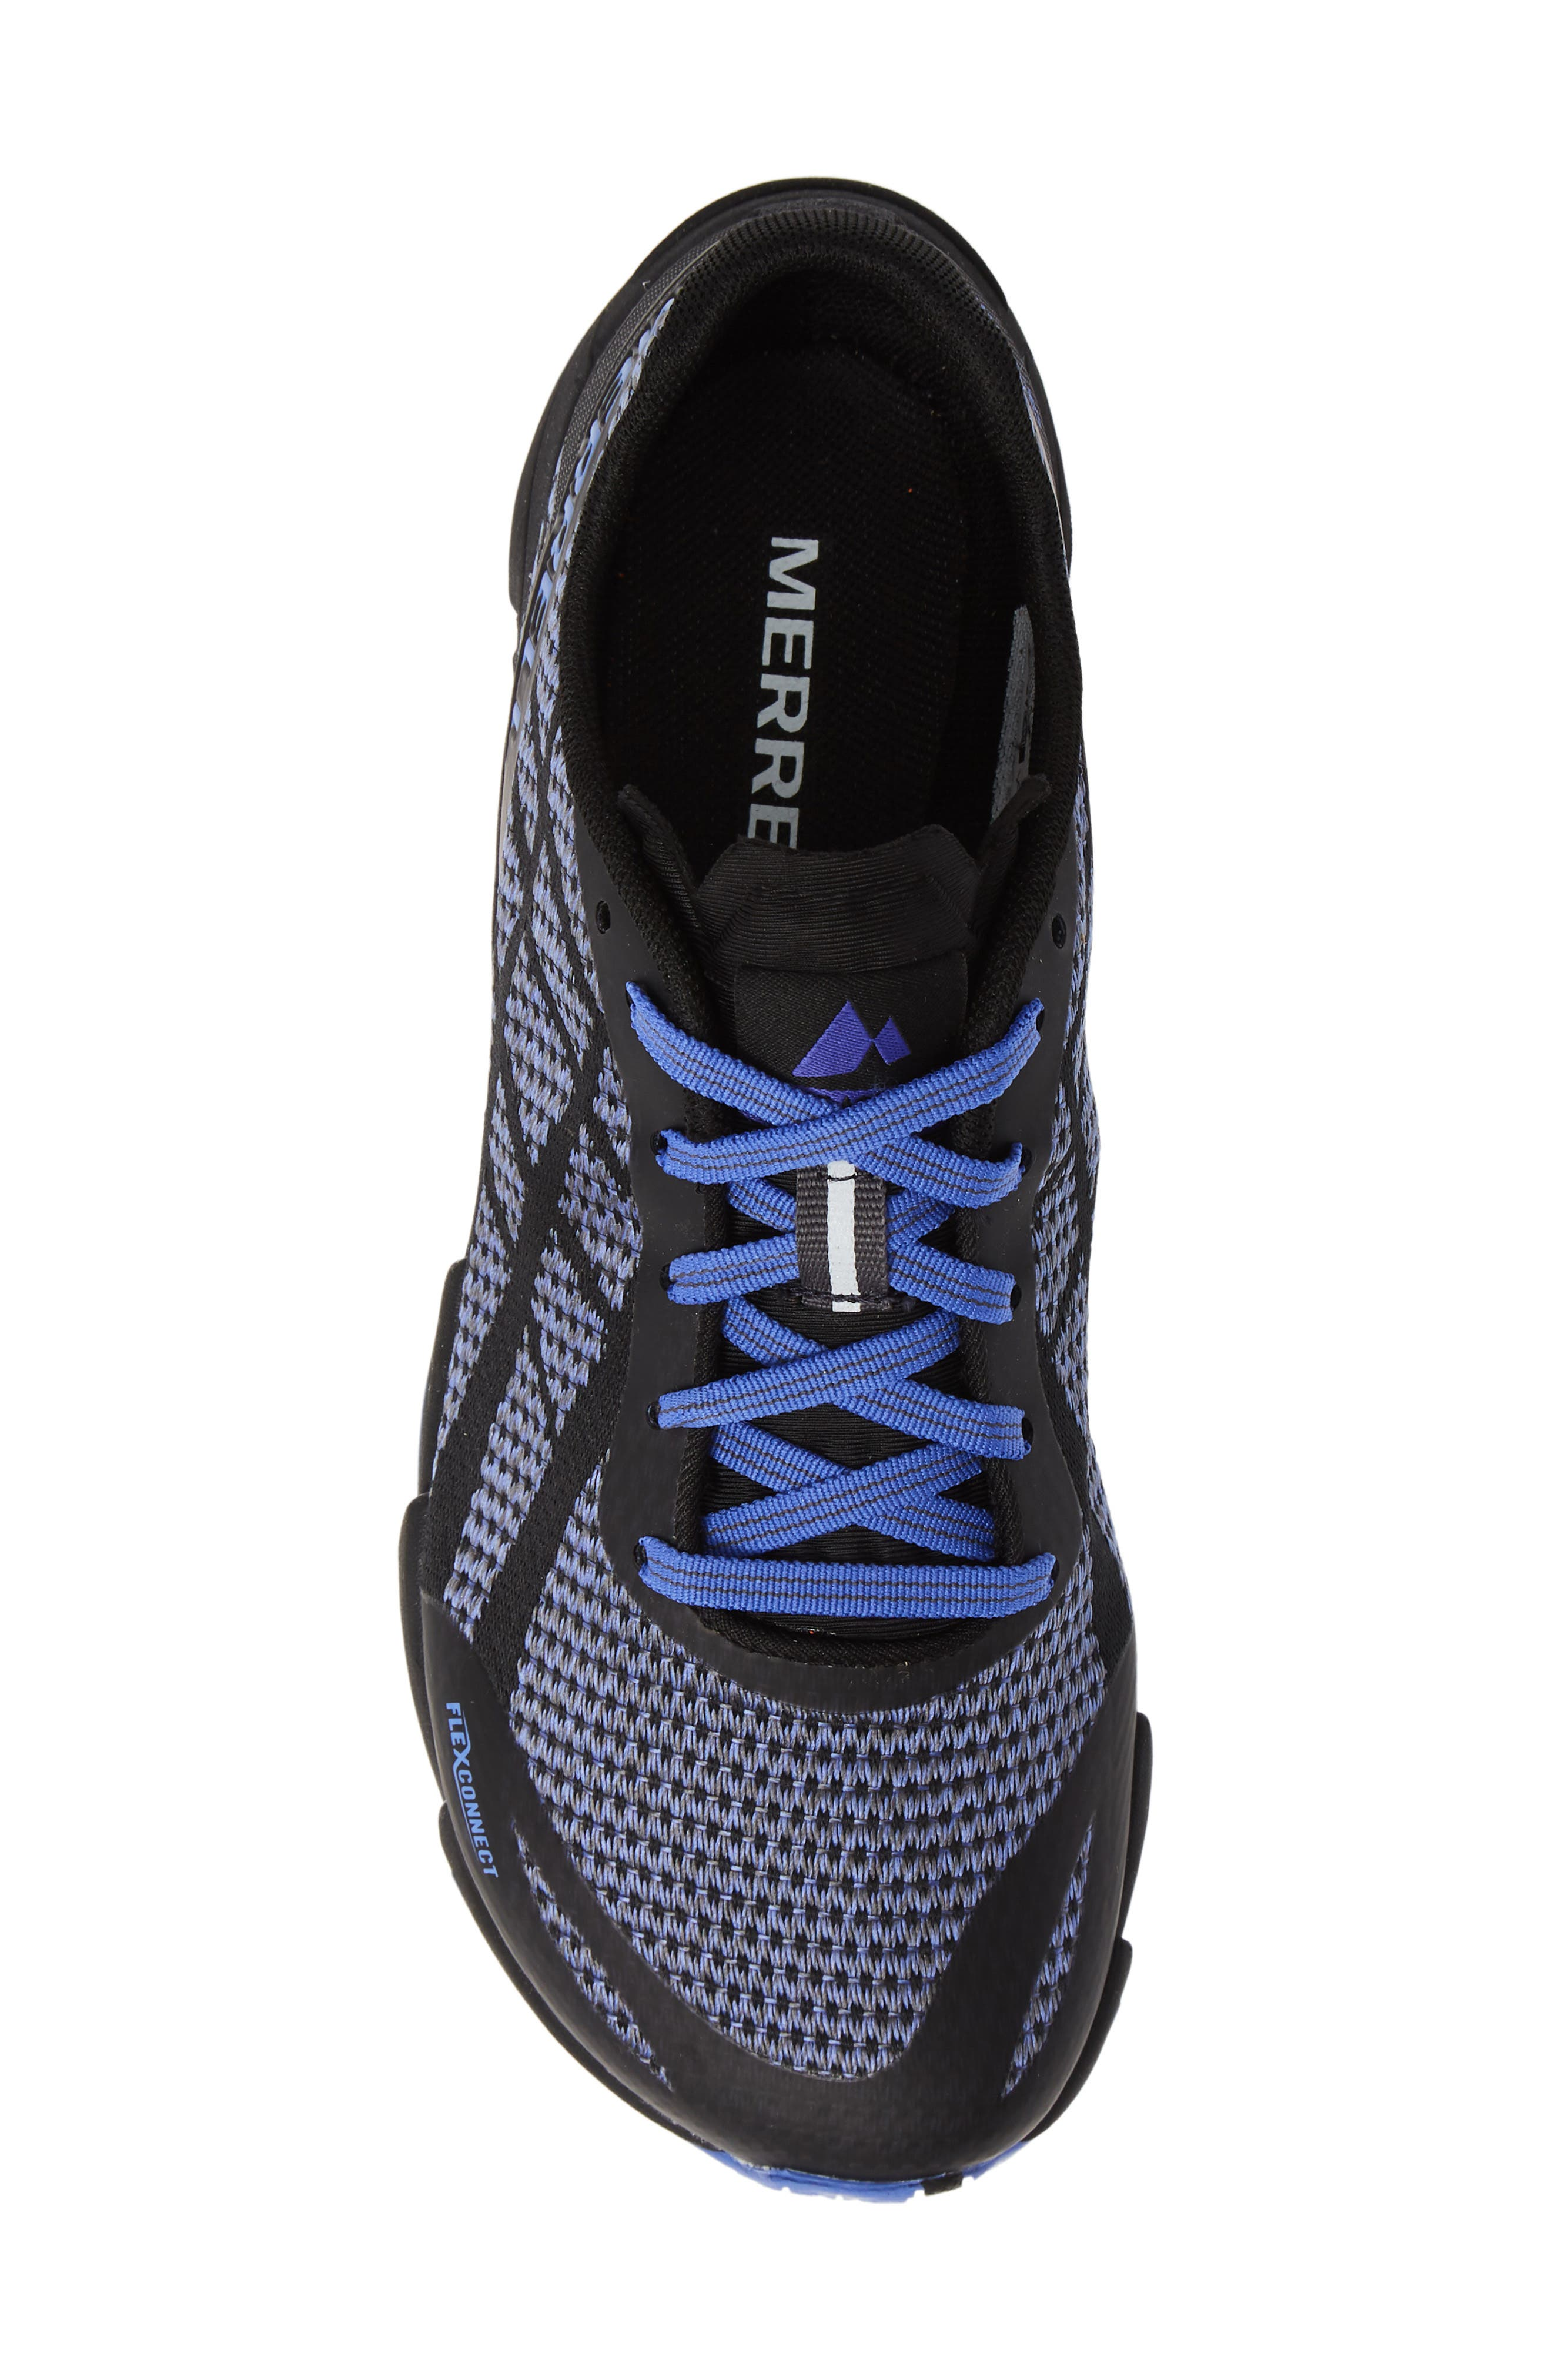 MERRELL, Bare Access Flex Shield Lace-Up Sneaker, Alternate thumbnail 5, color, 001